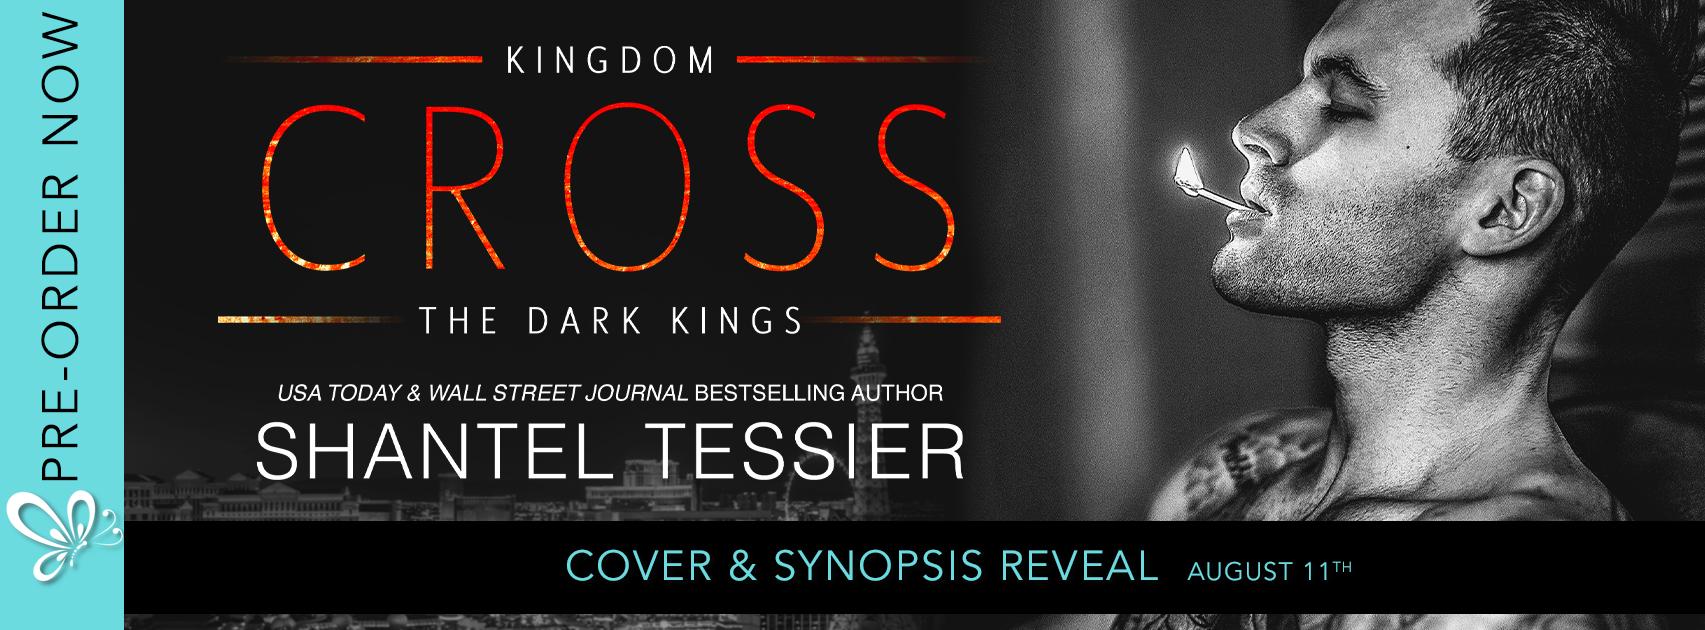 Cross by Shantel Tessier